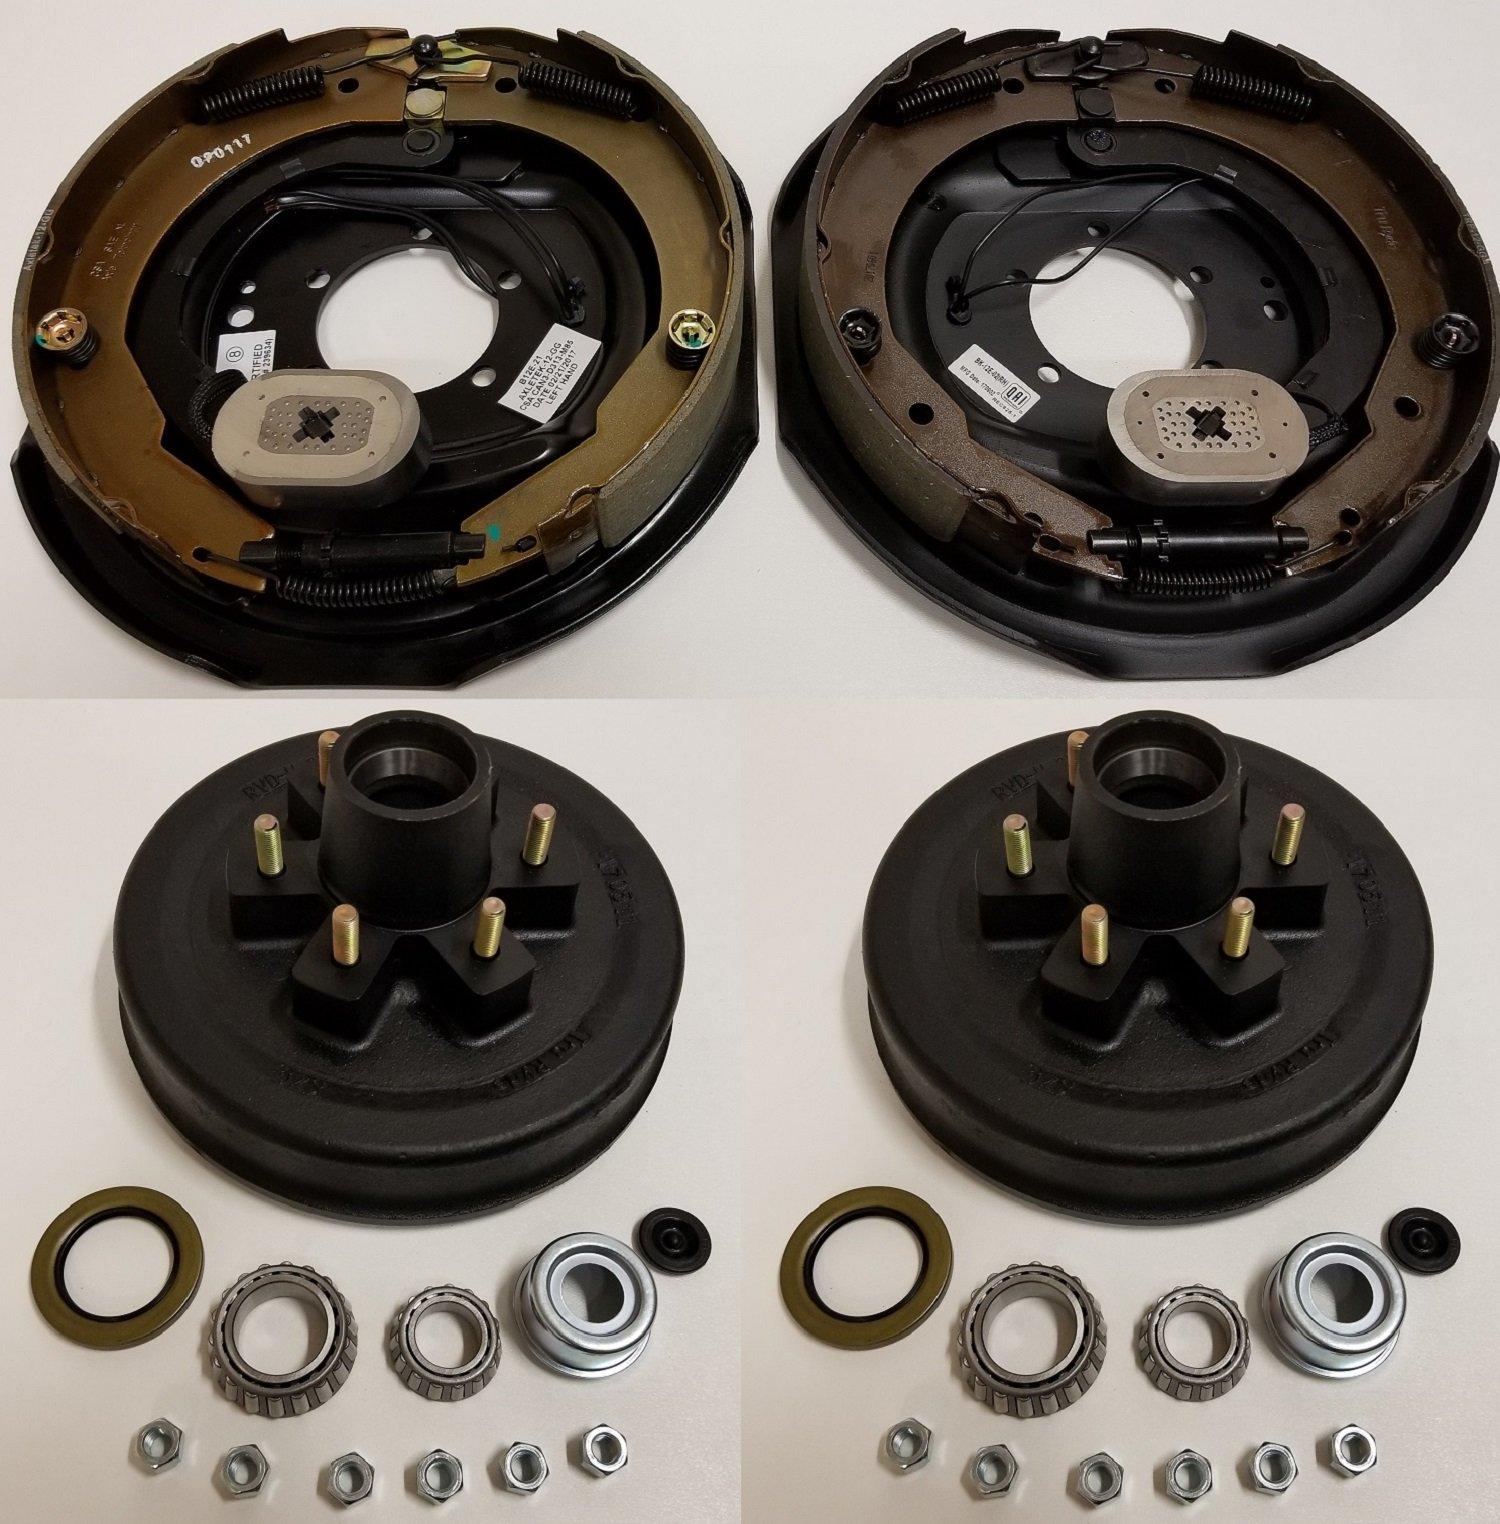 Southwest Wheel 5,200 lbs. Trailer Axle Self Adjusting Electric Brake Kit by Southwest Wheel